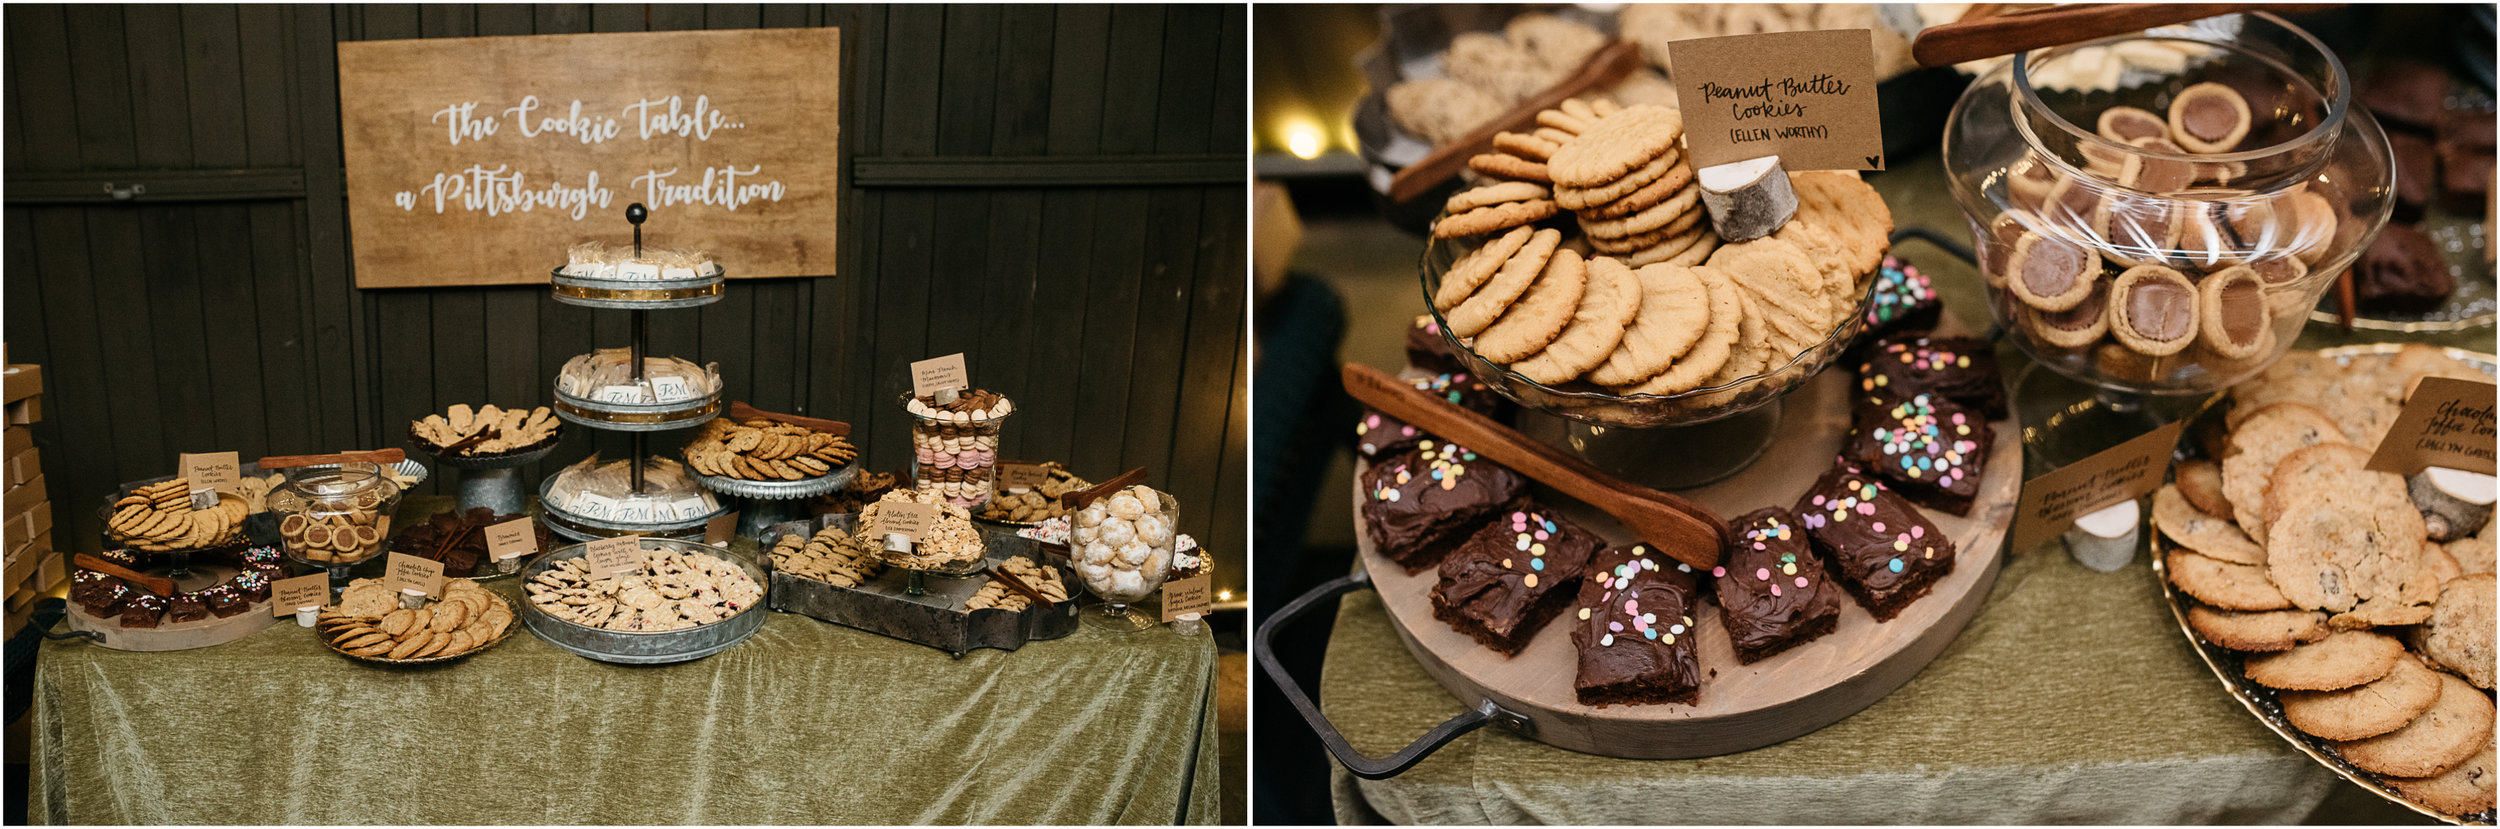 cookie table pittsburgh wedding morning glory inn.jpg